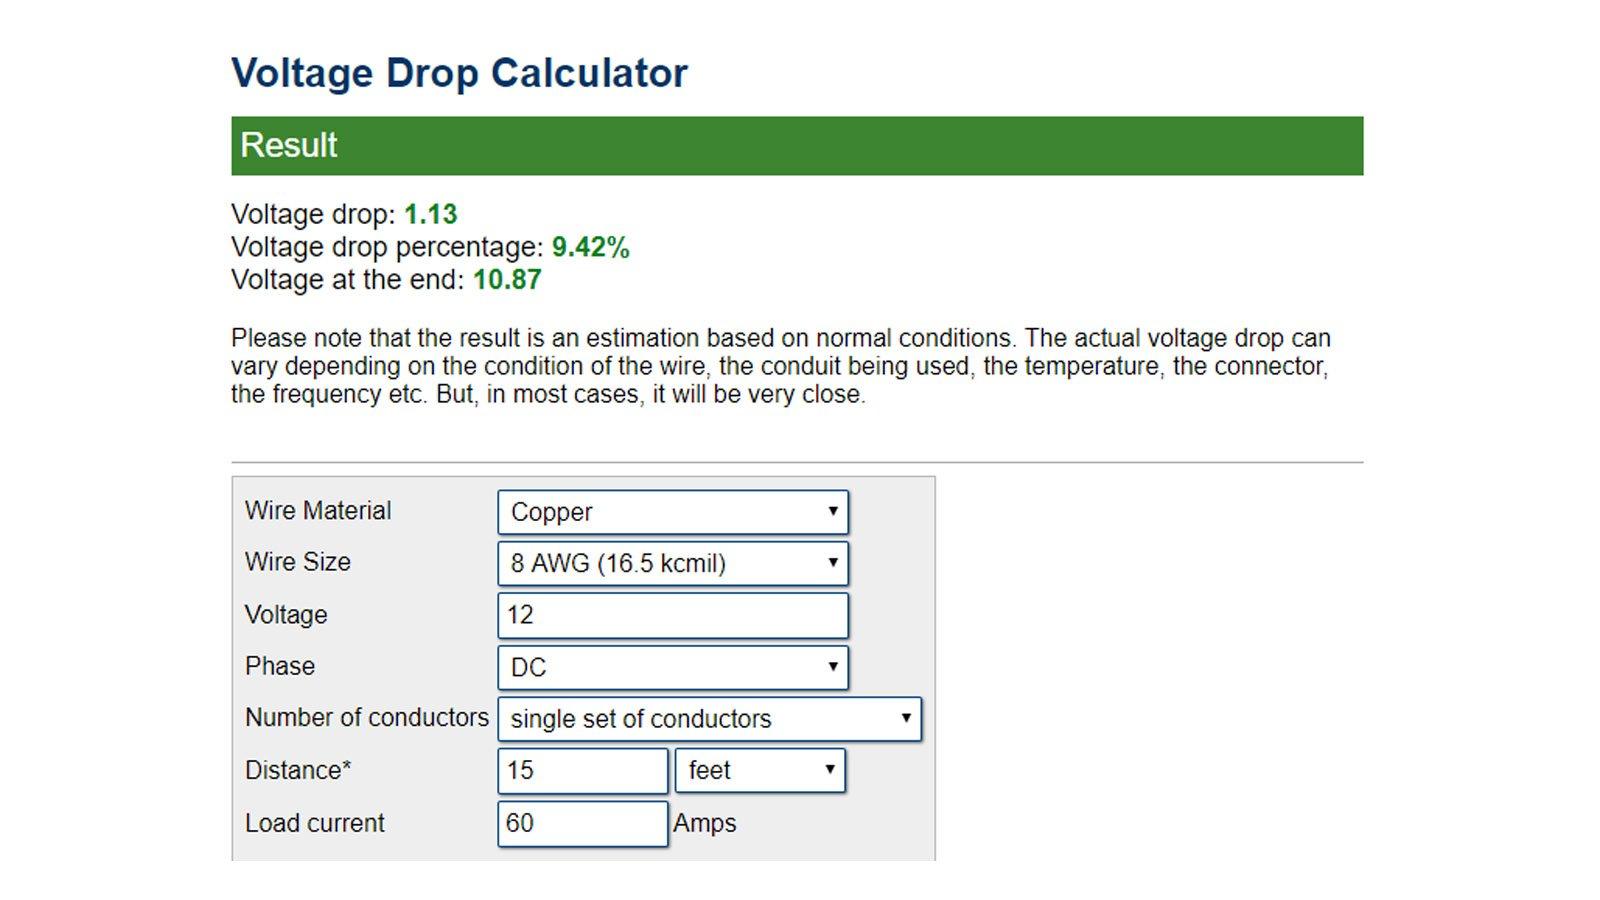 12VDC Voltage Drop / 15 Feet / 8 AWG